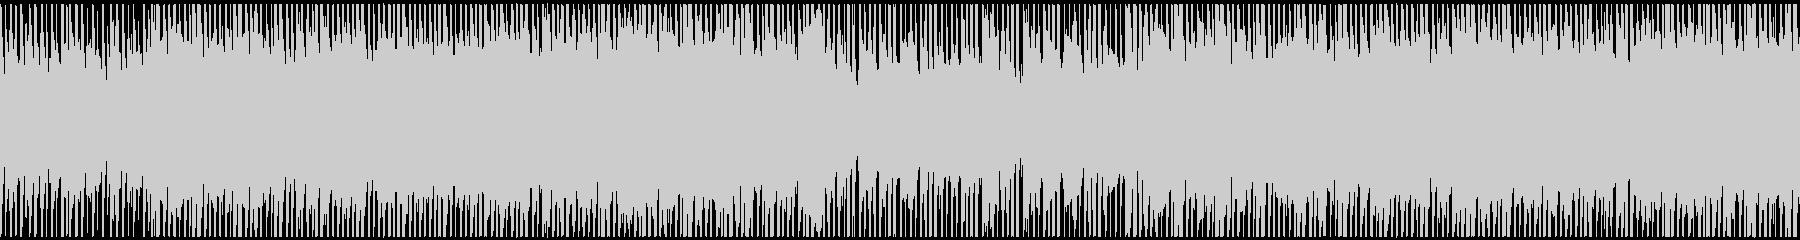 [Loopable] Gentle Happy Upbeat Pop's unreproduced waveform